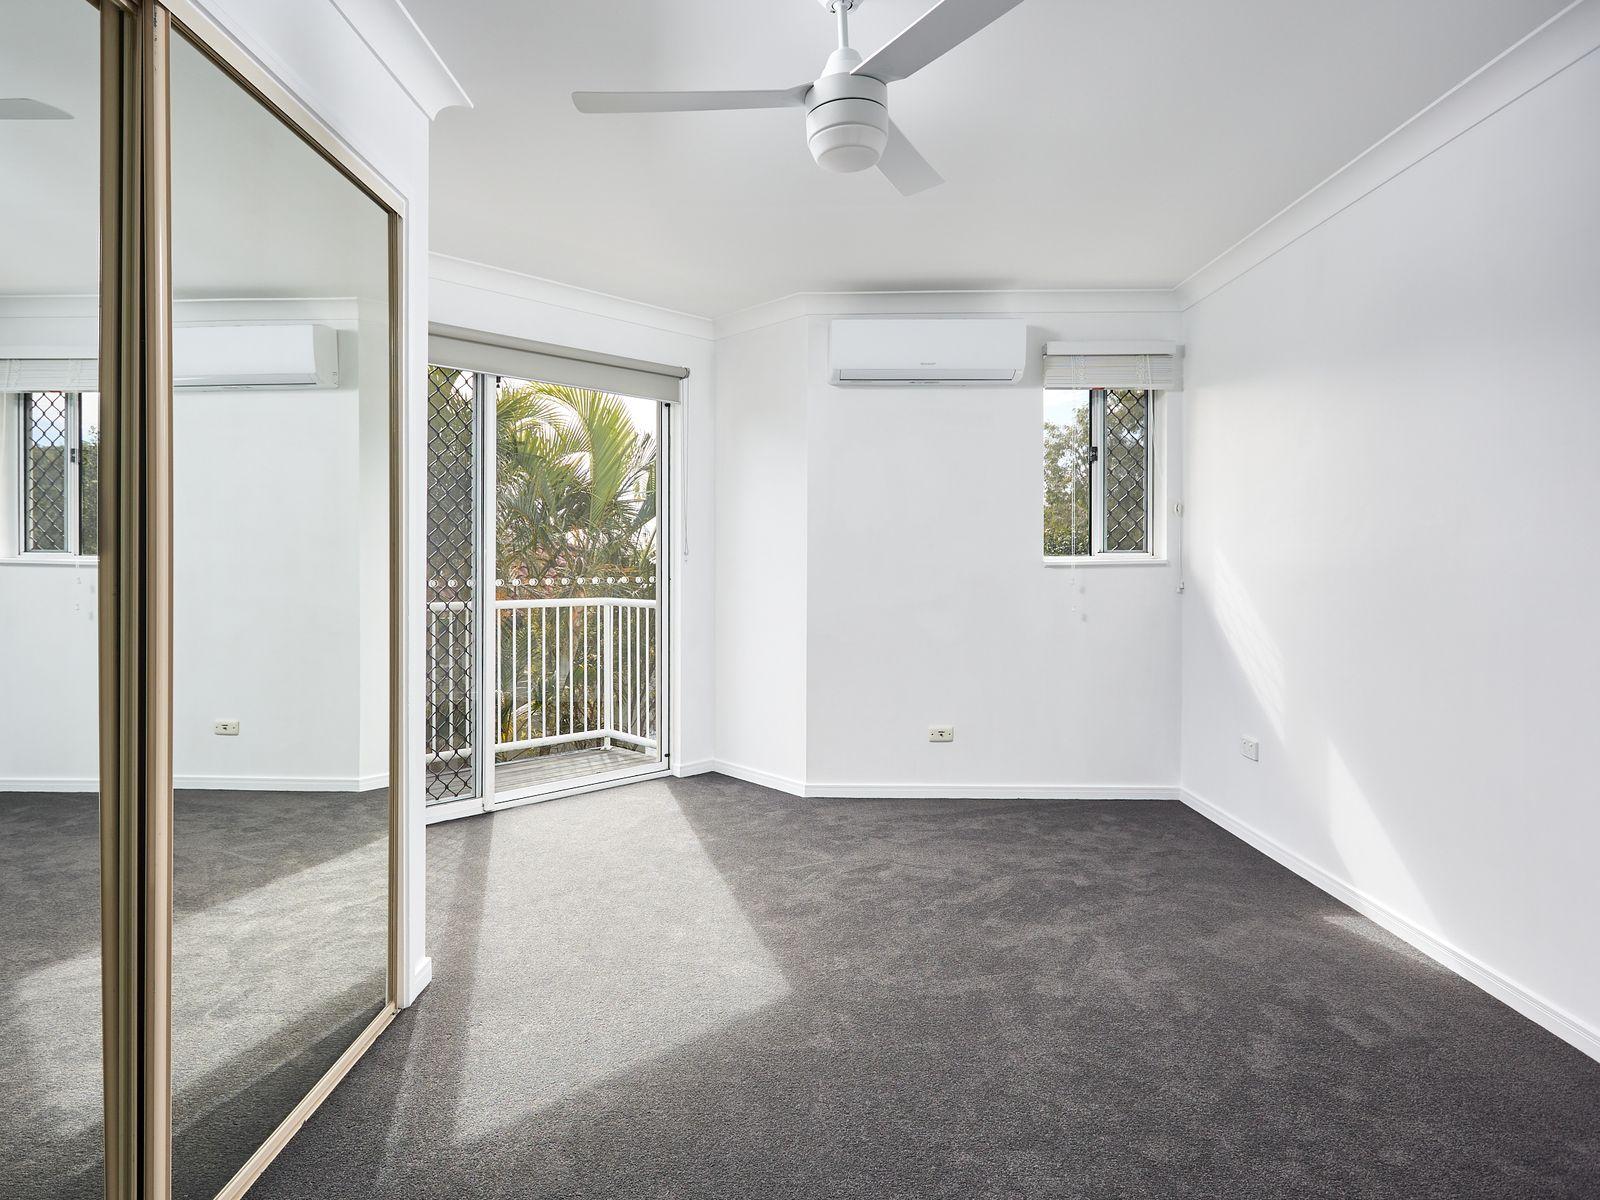 7/6 Buddy Holly Close, Parkwood, QLD 4214